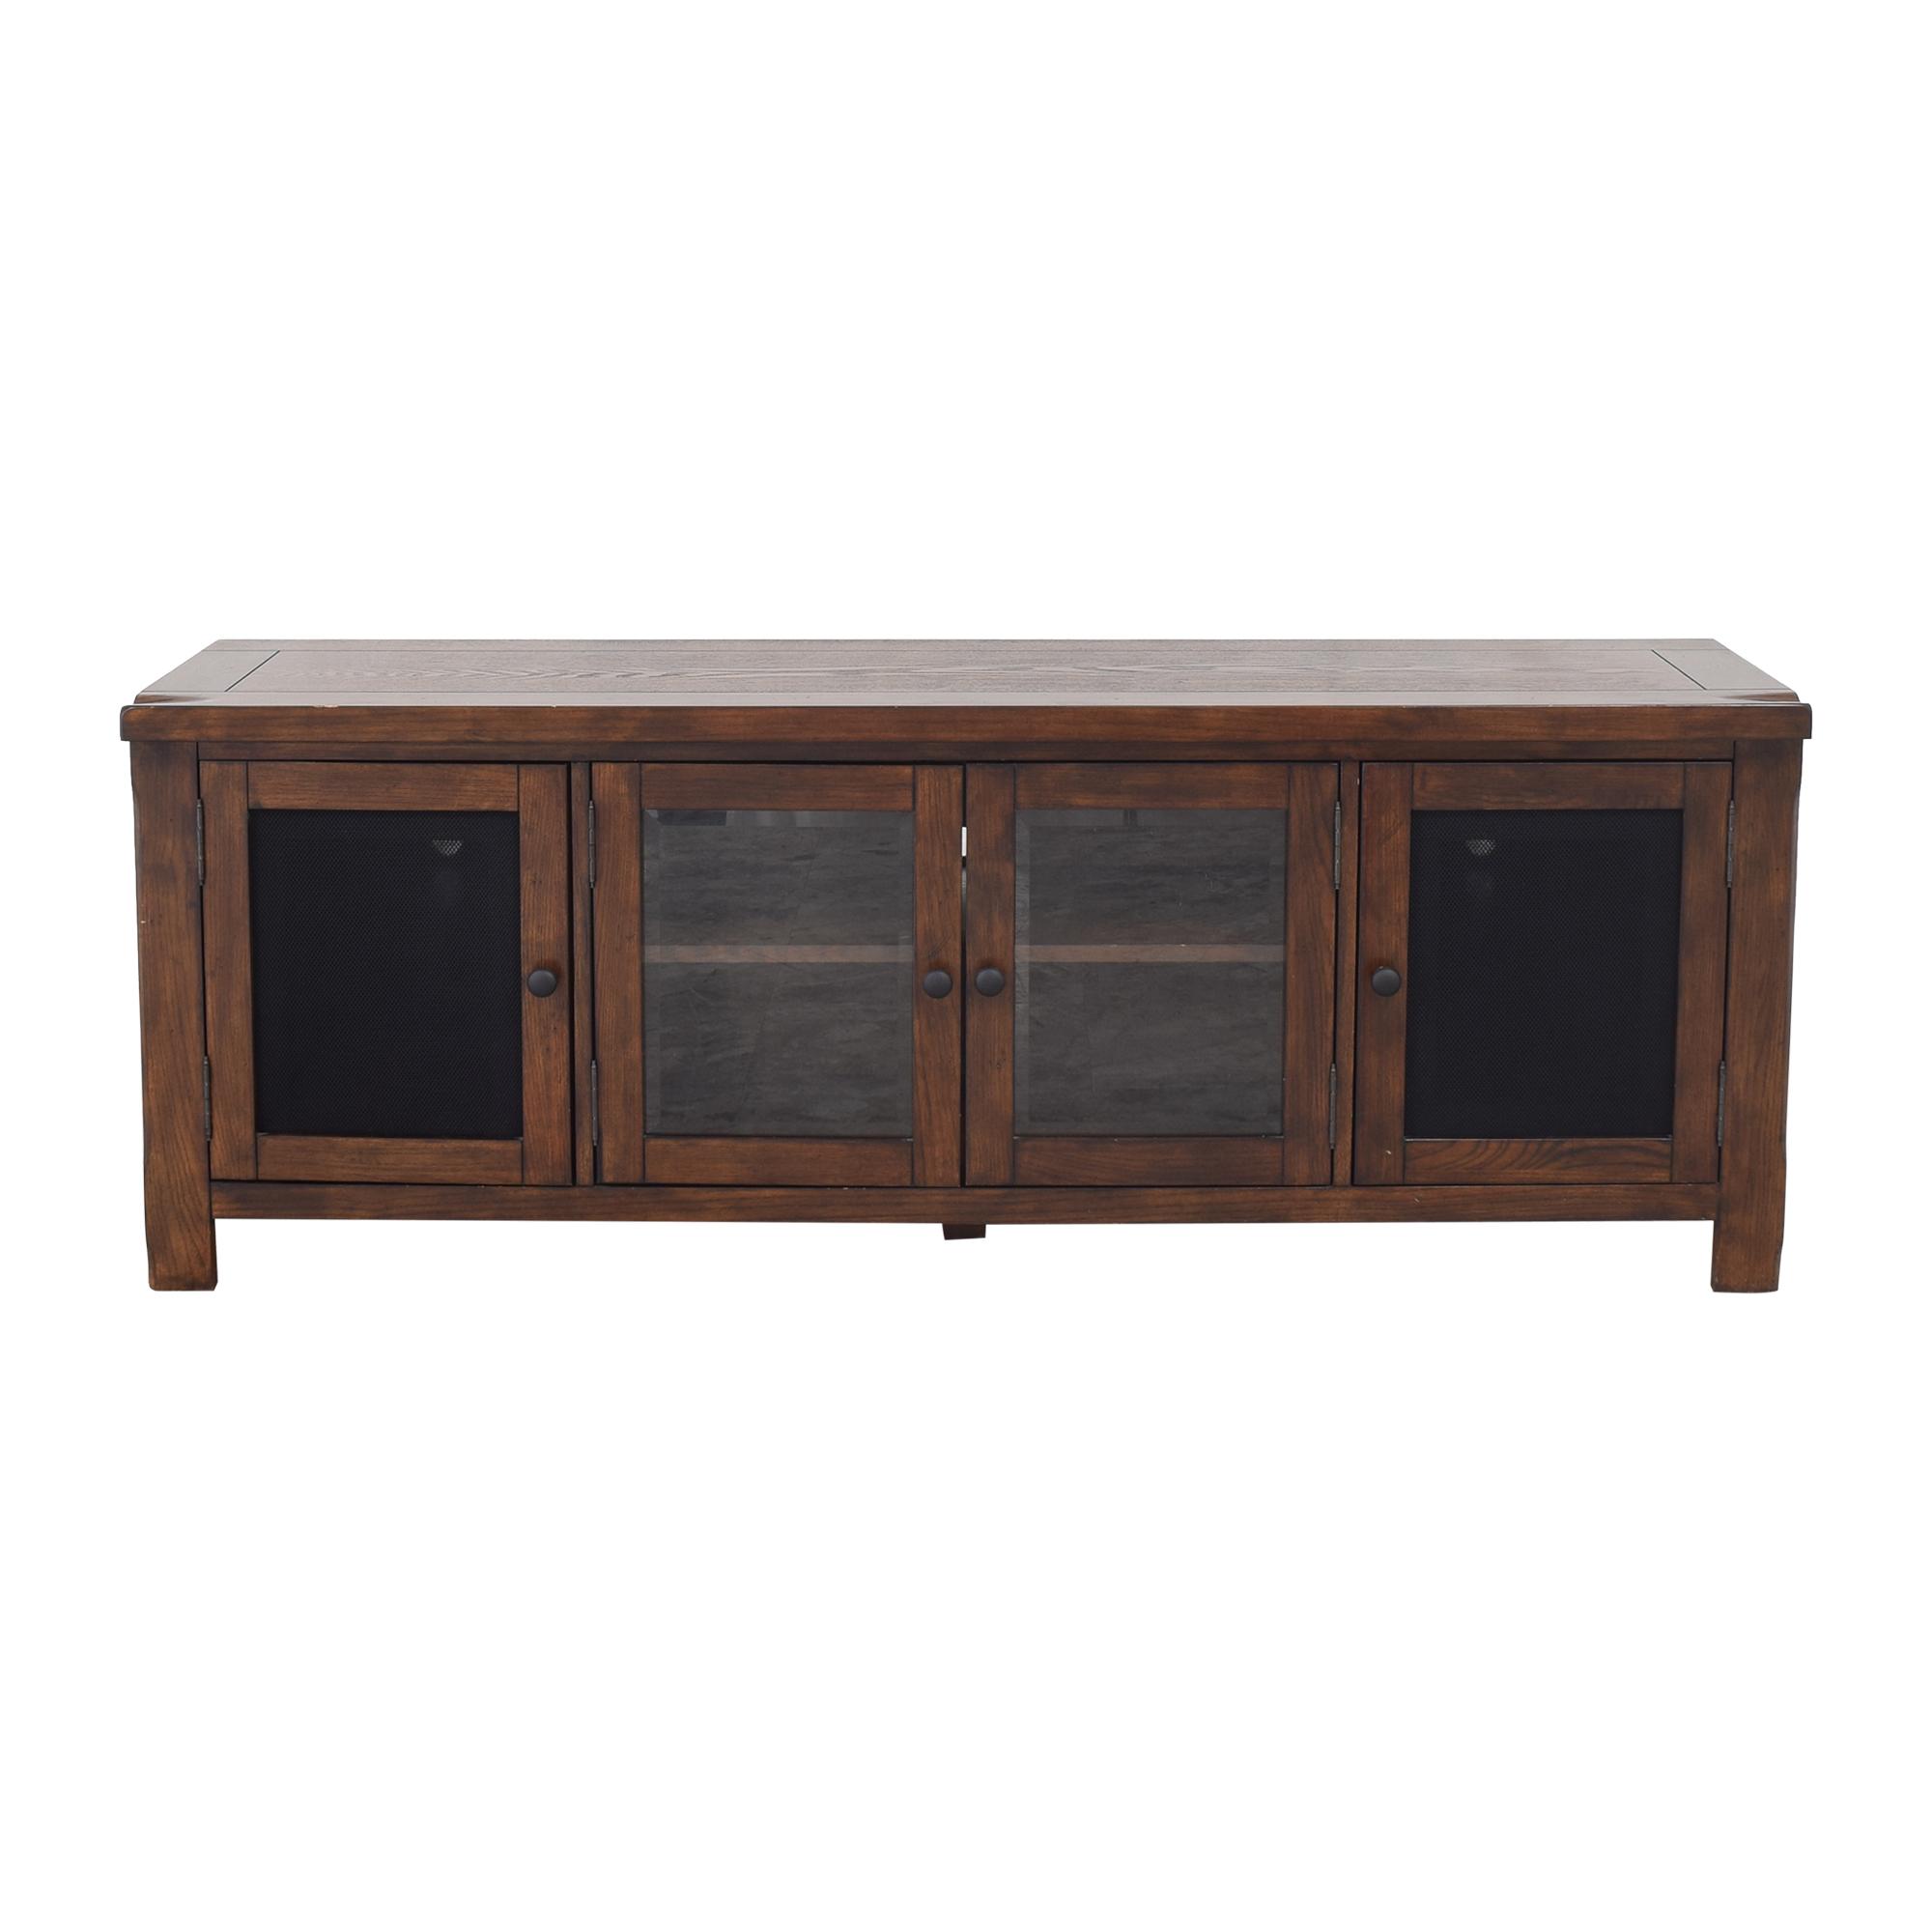 Emerald Home Furnishings Pampa Furniture Media Center pa